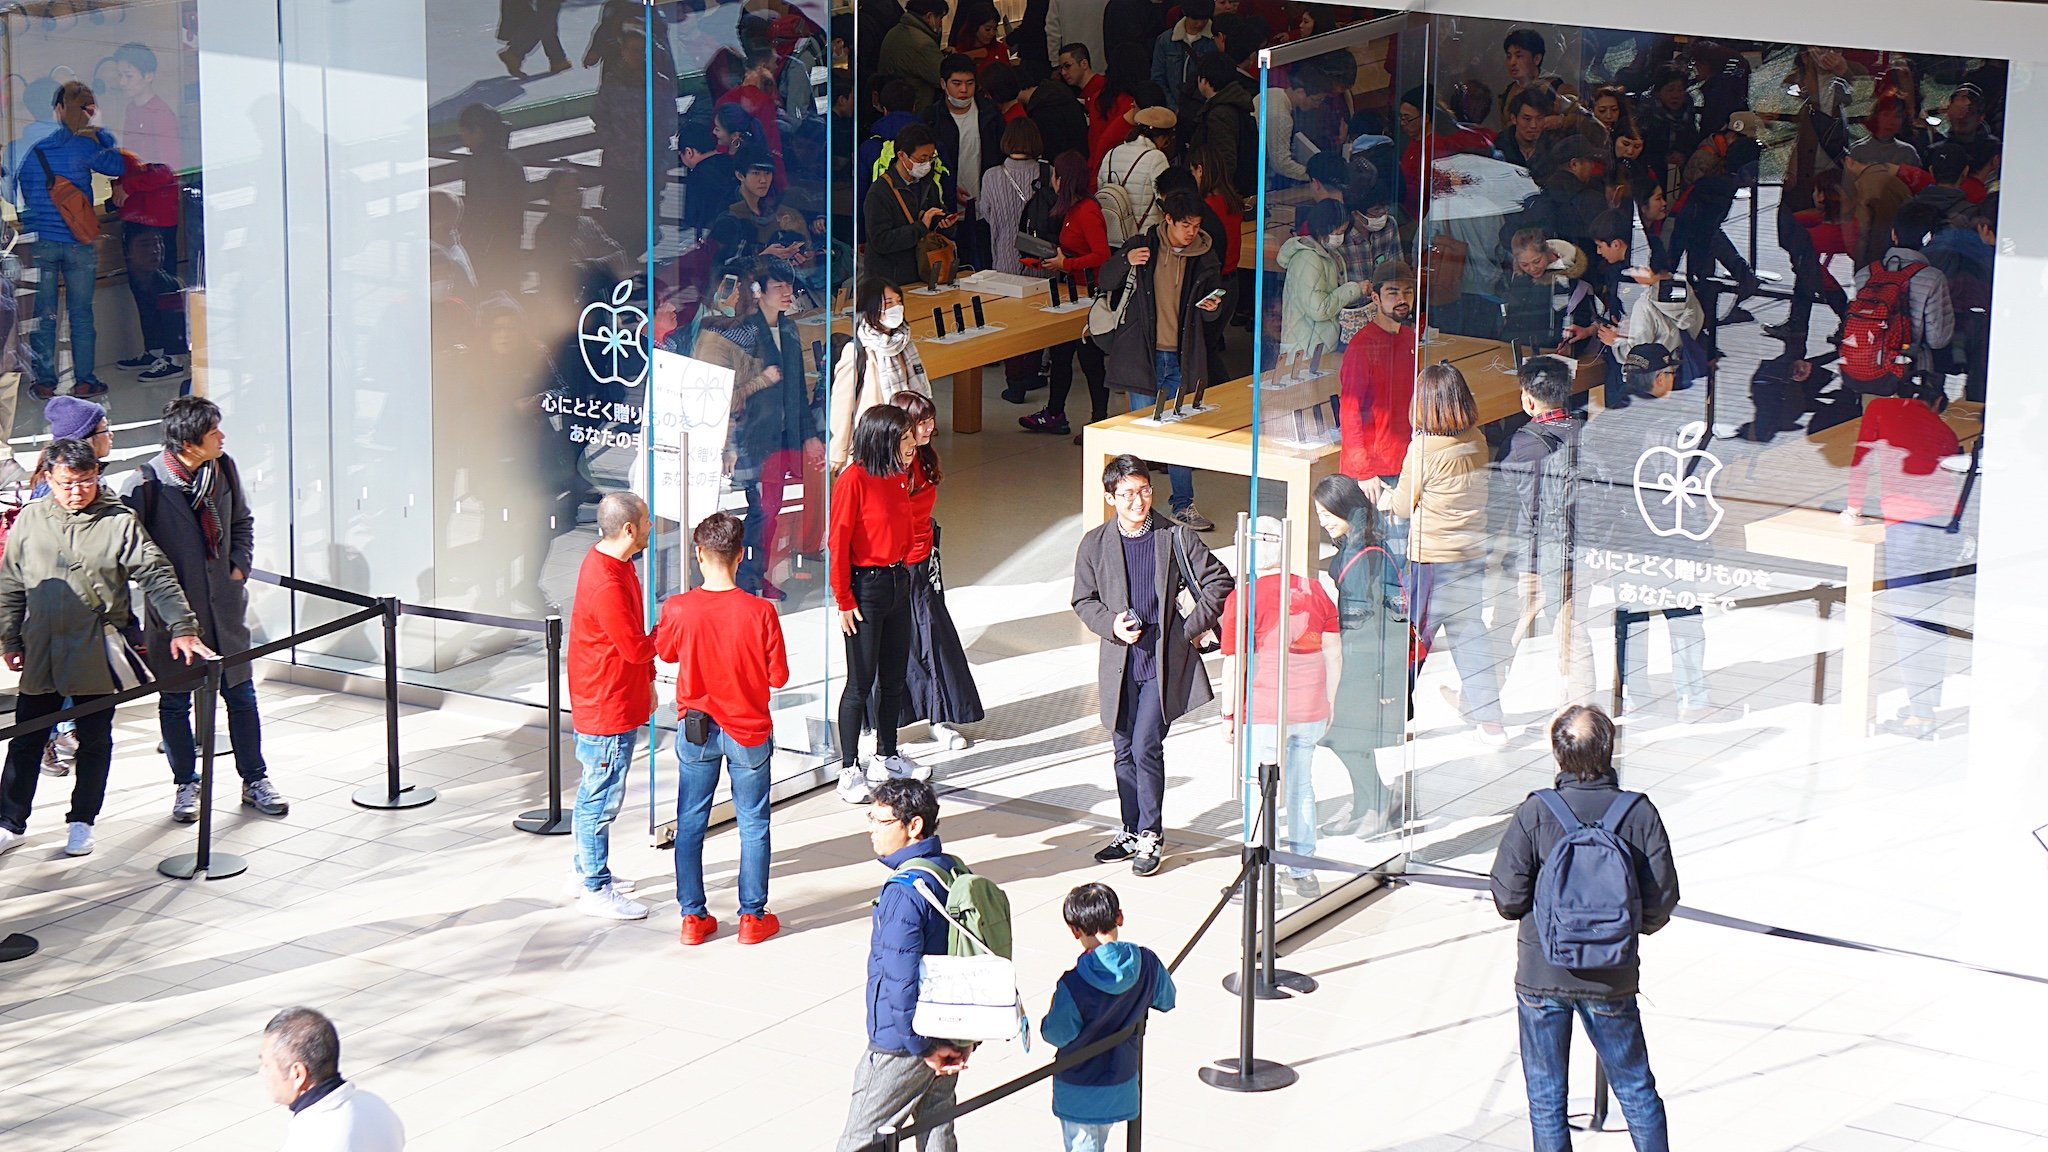 「Apple川崎」がオープン。1,600人超の行列、記念トートバッグ配布終了